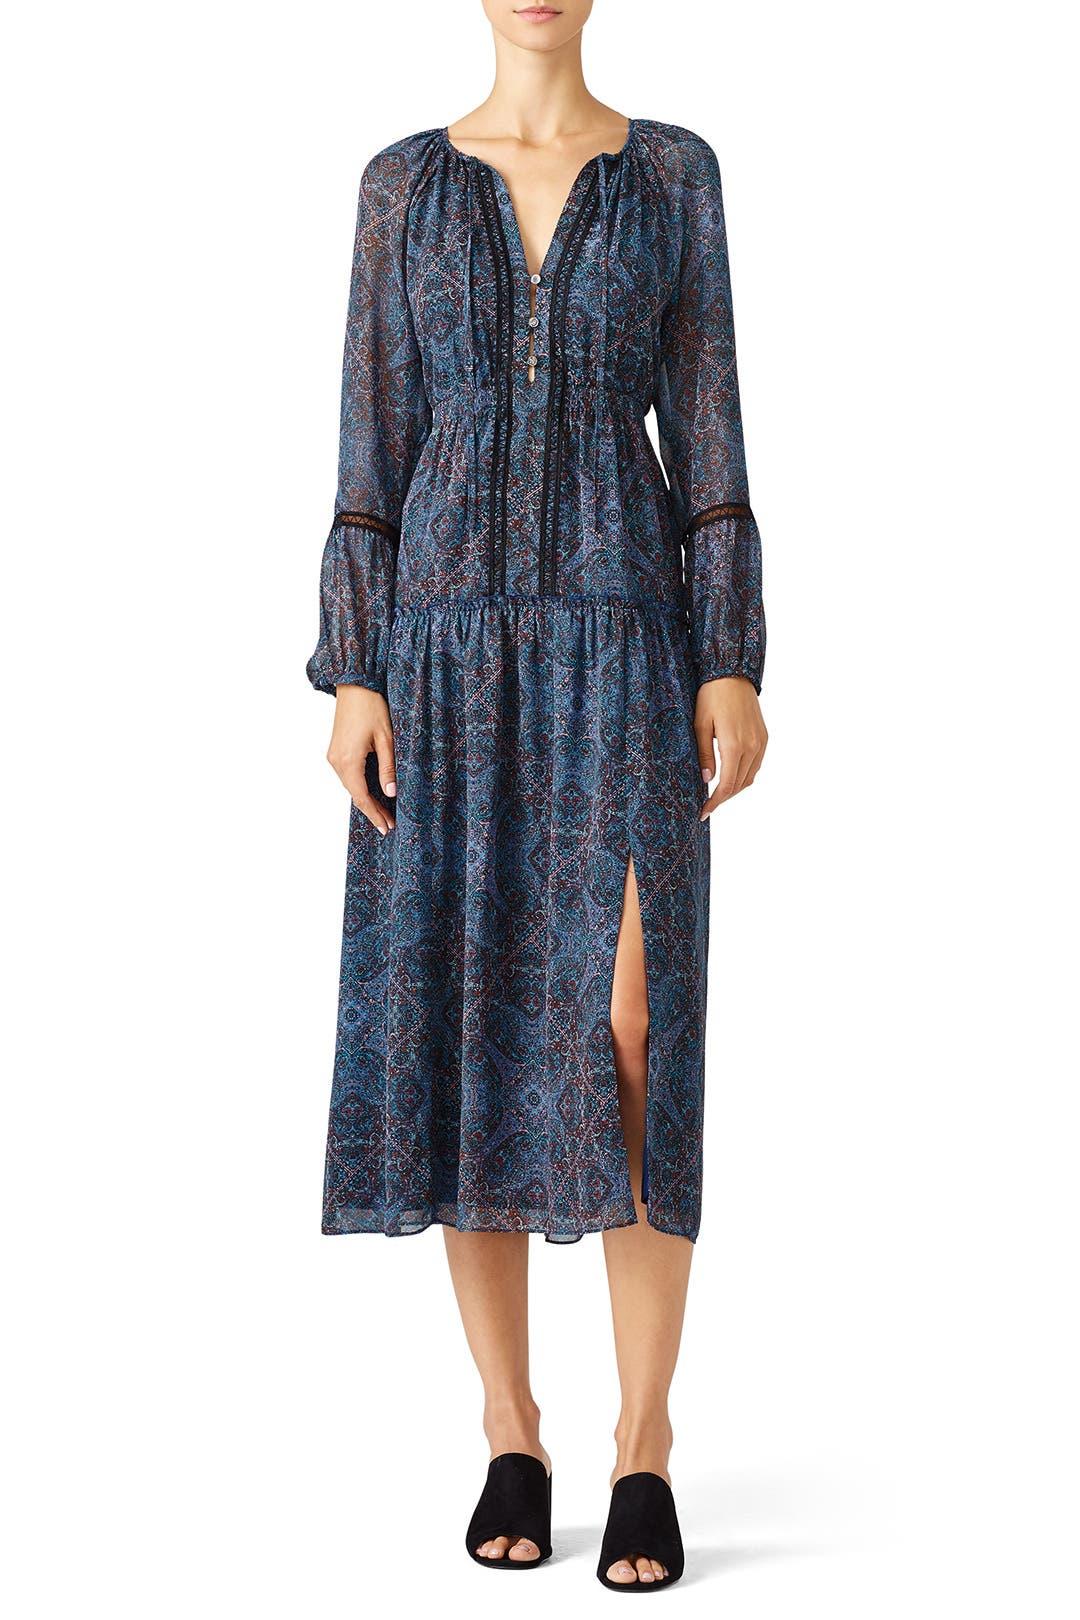 Monarch Handkerchief Dress by ella moss for  40  0a1d3ecc7